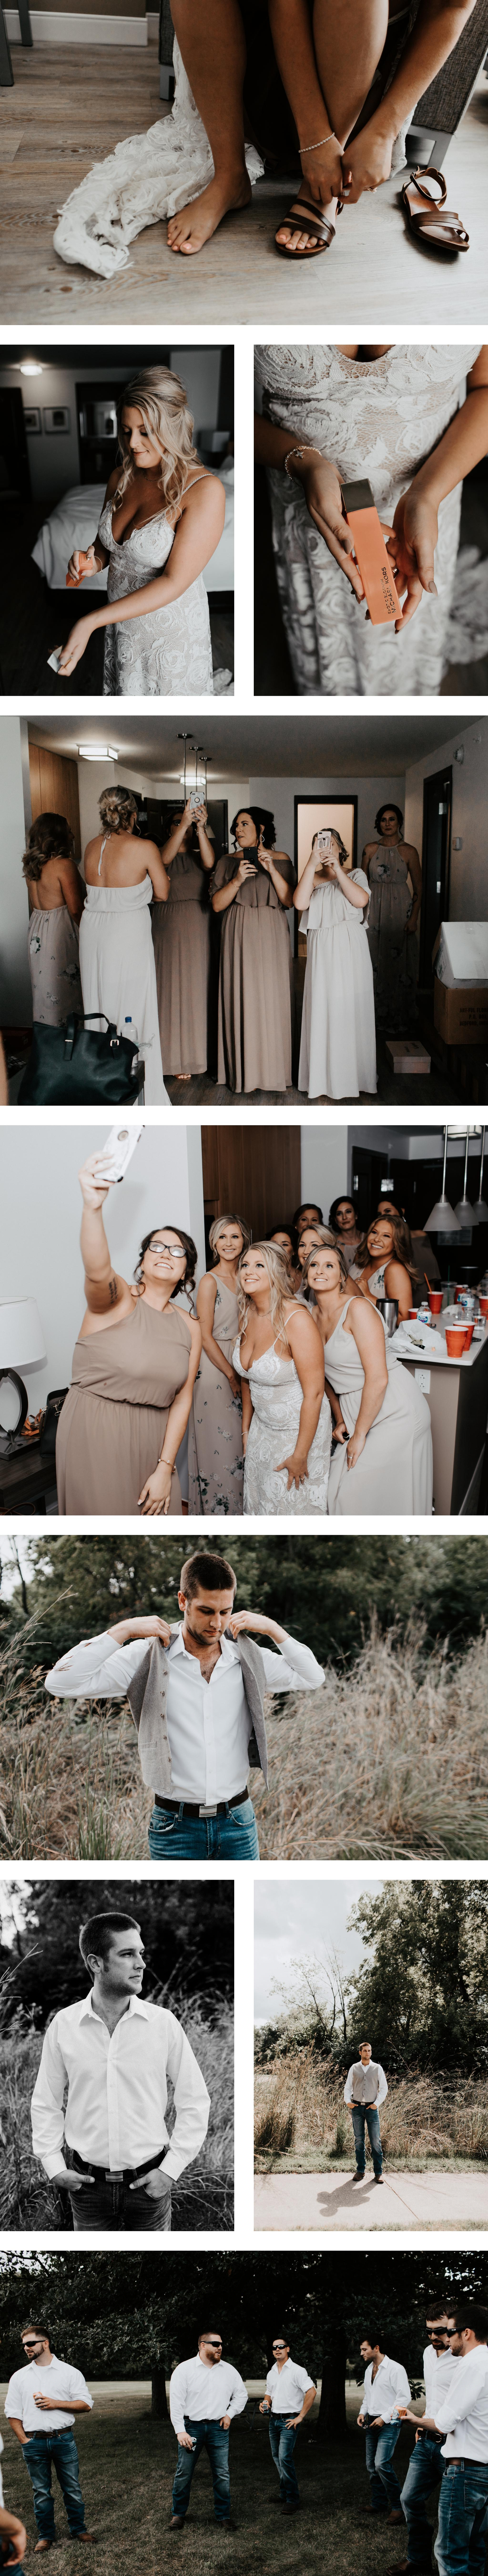 The Pudik Wedding 4.jpg